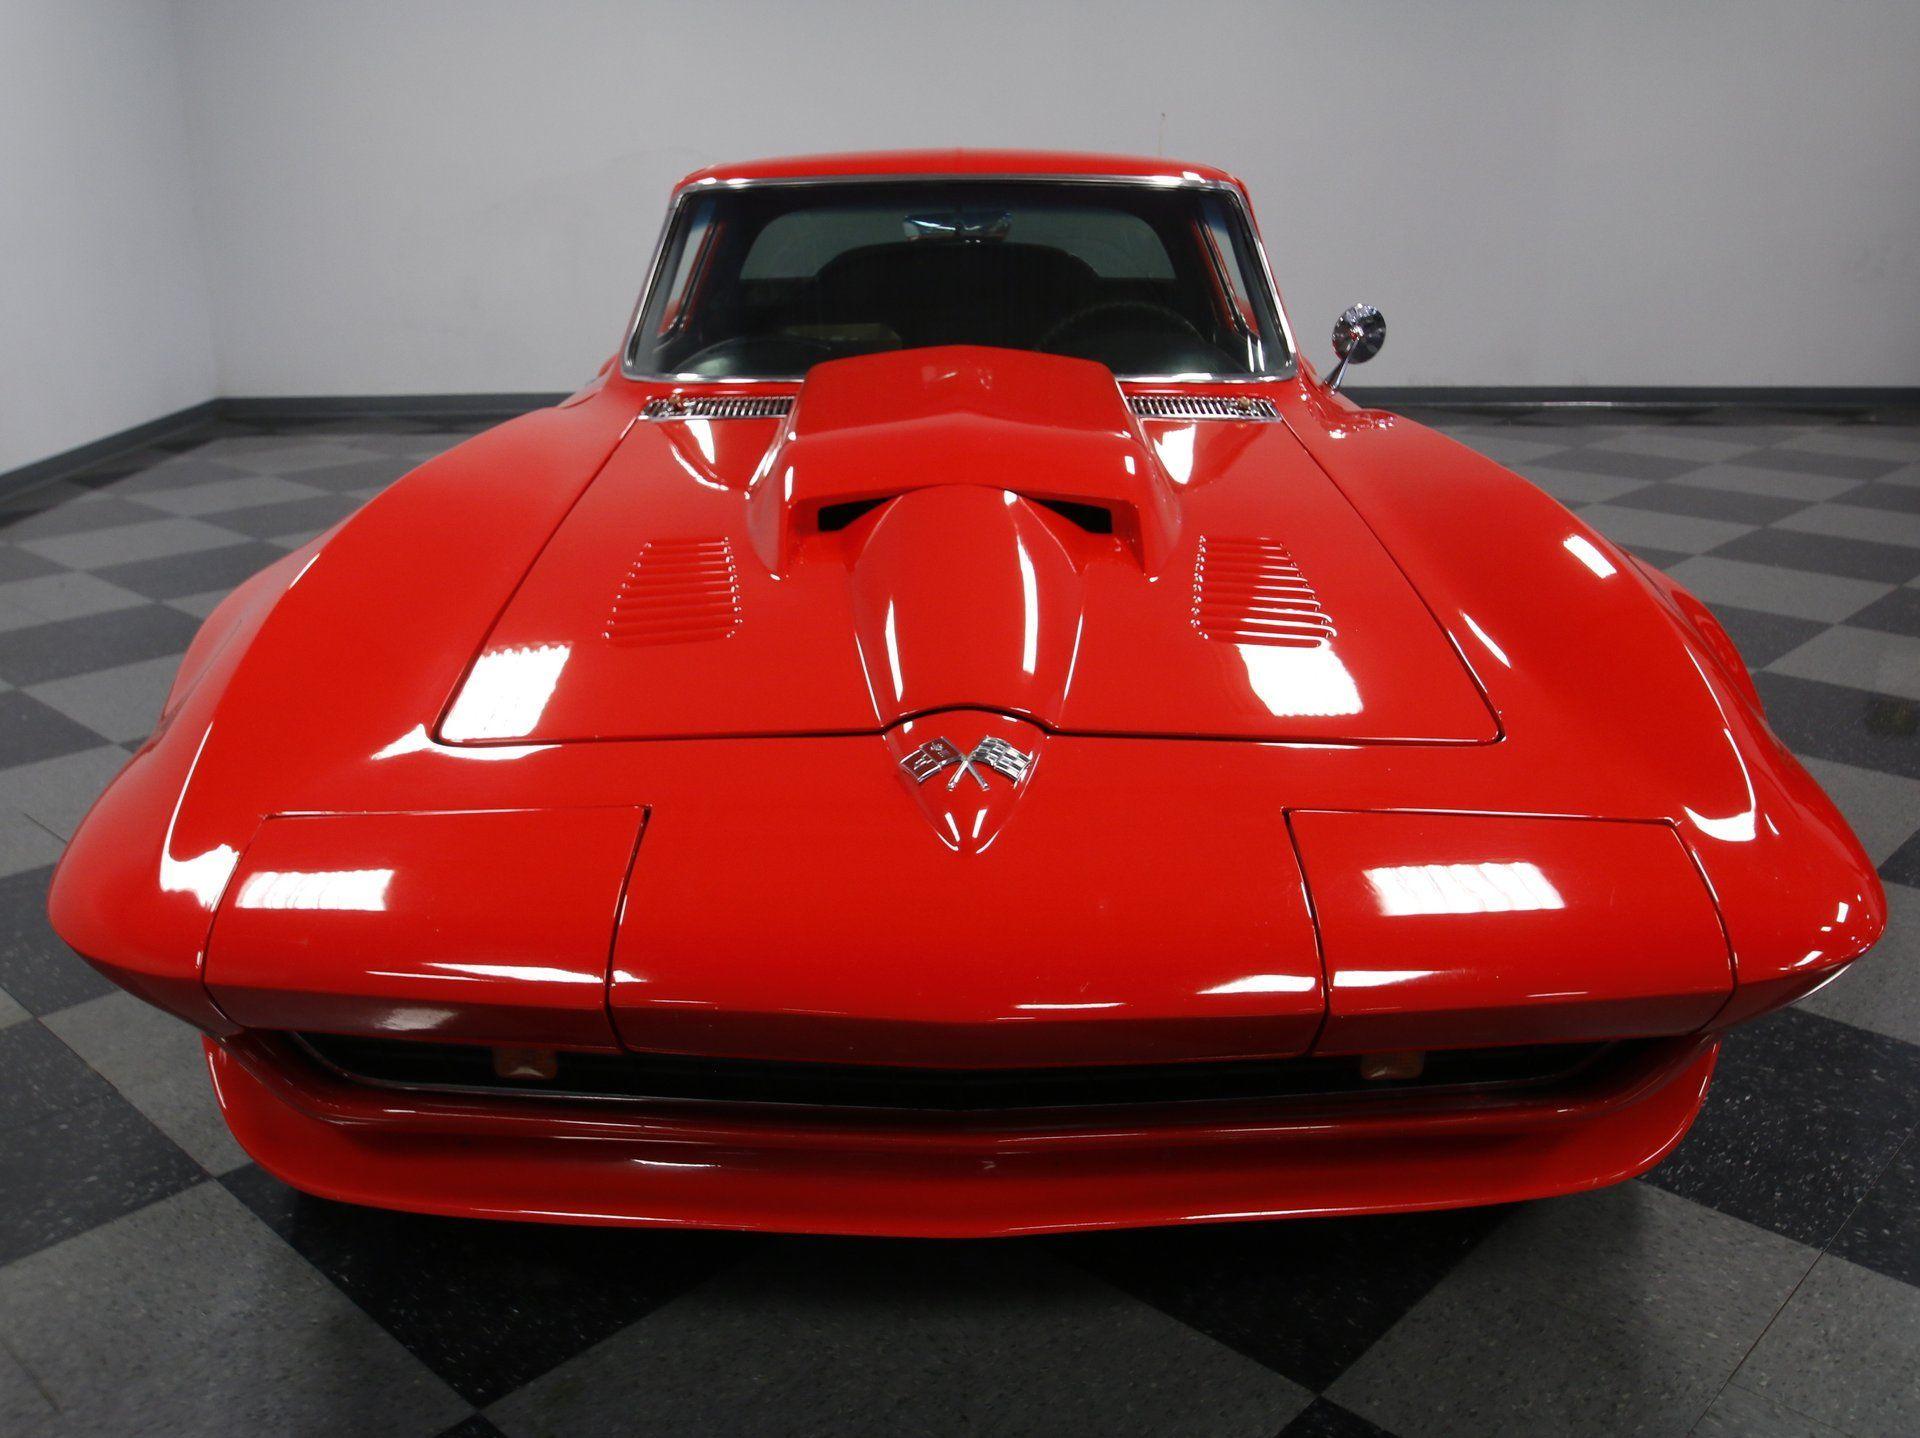 1966 Chevrolet Corvette | Streetside Classics – The Nation's Trusted Classic…